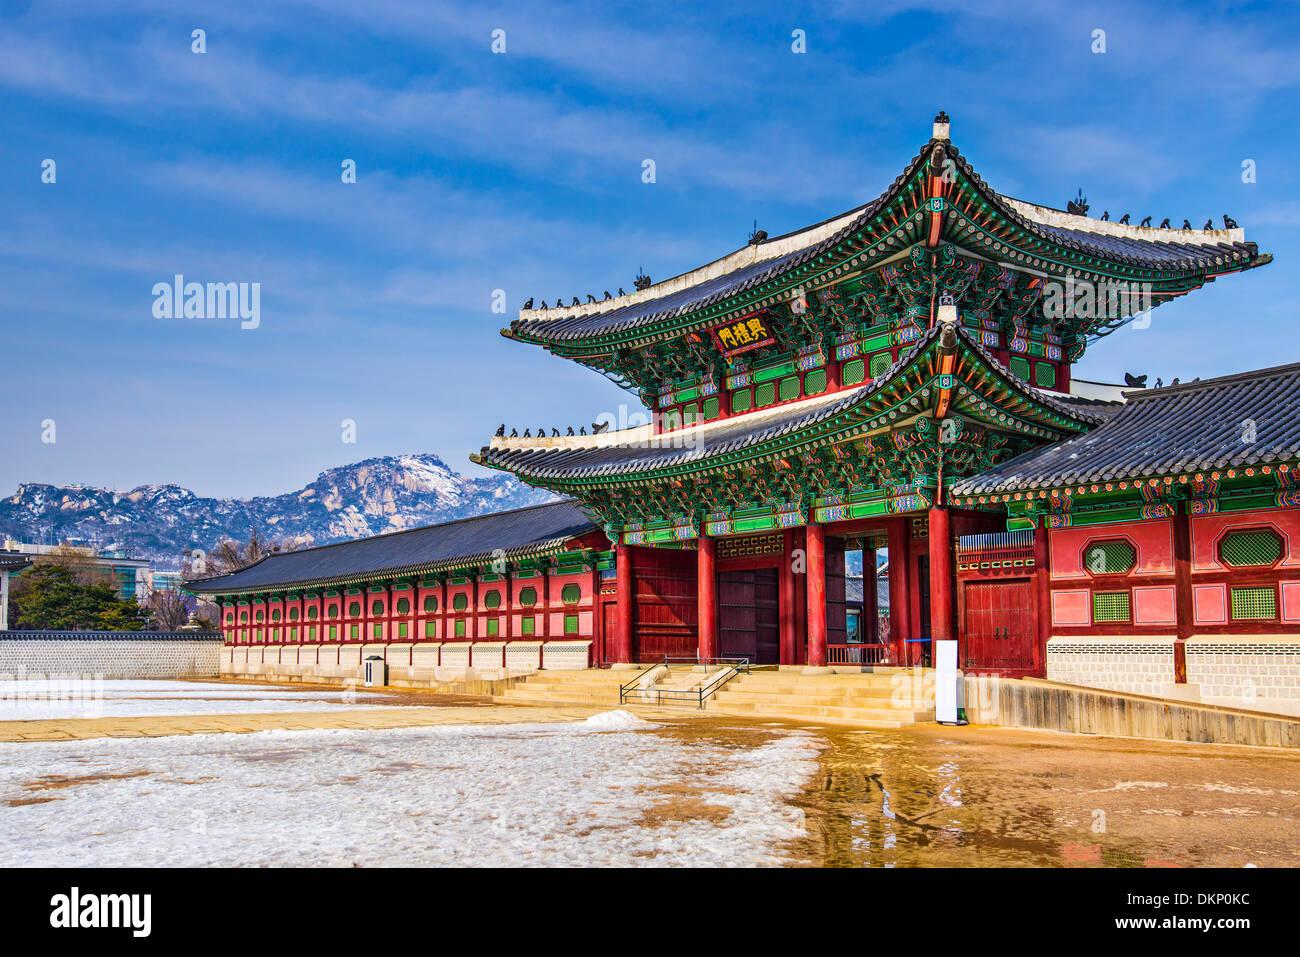 Gyeongbokgung Palace grounds in Seoul, South Korea. - Stock Image